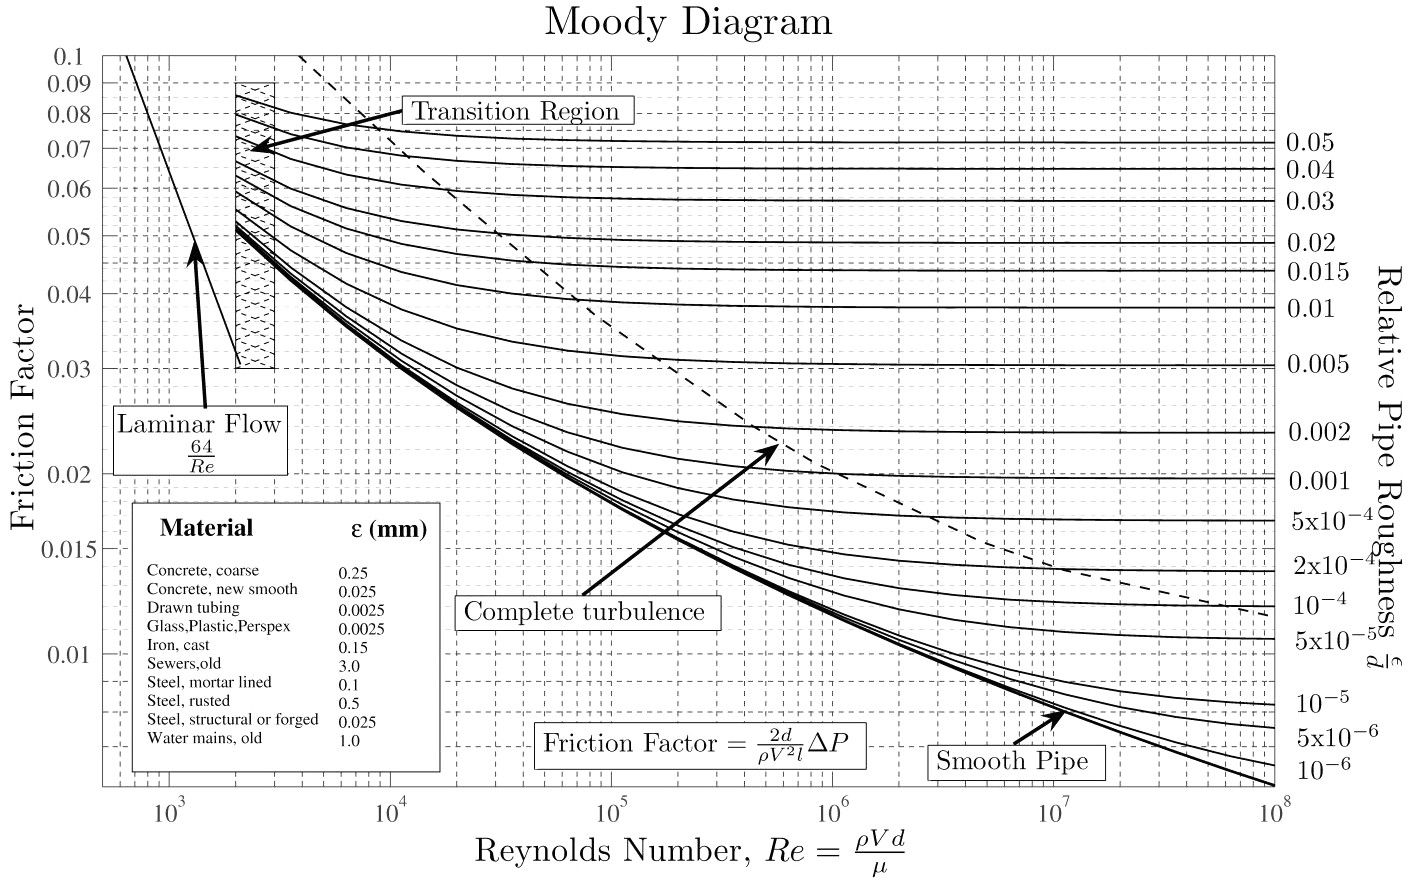 moody diagram - Équation de darcy-weisbach — wikipédia